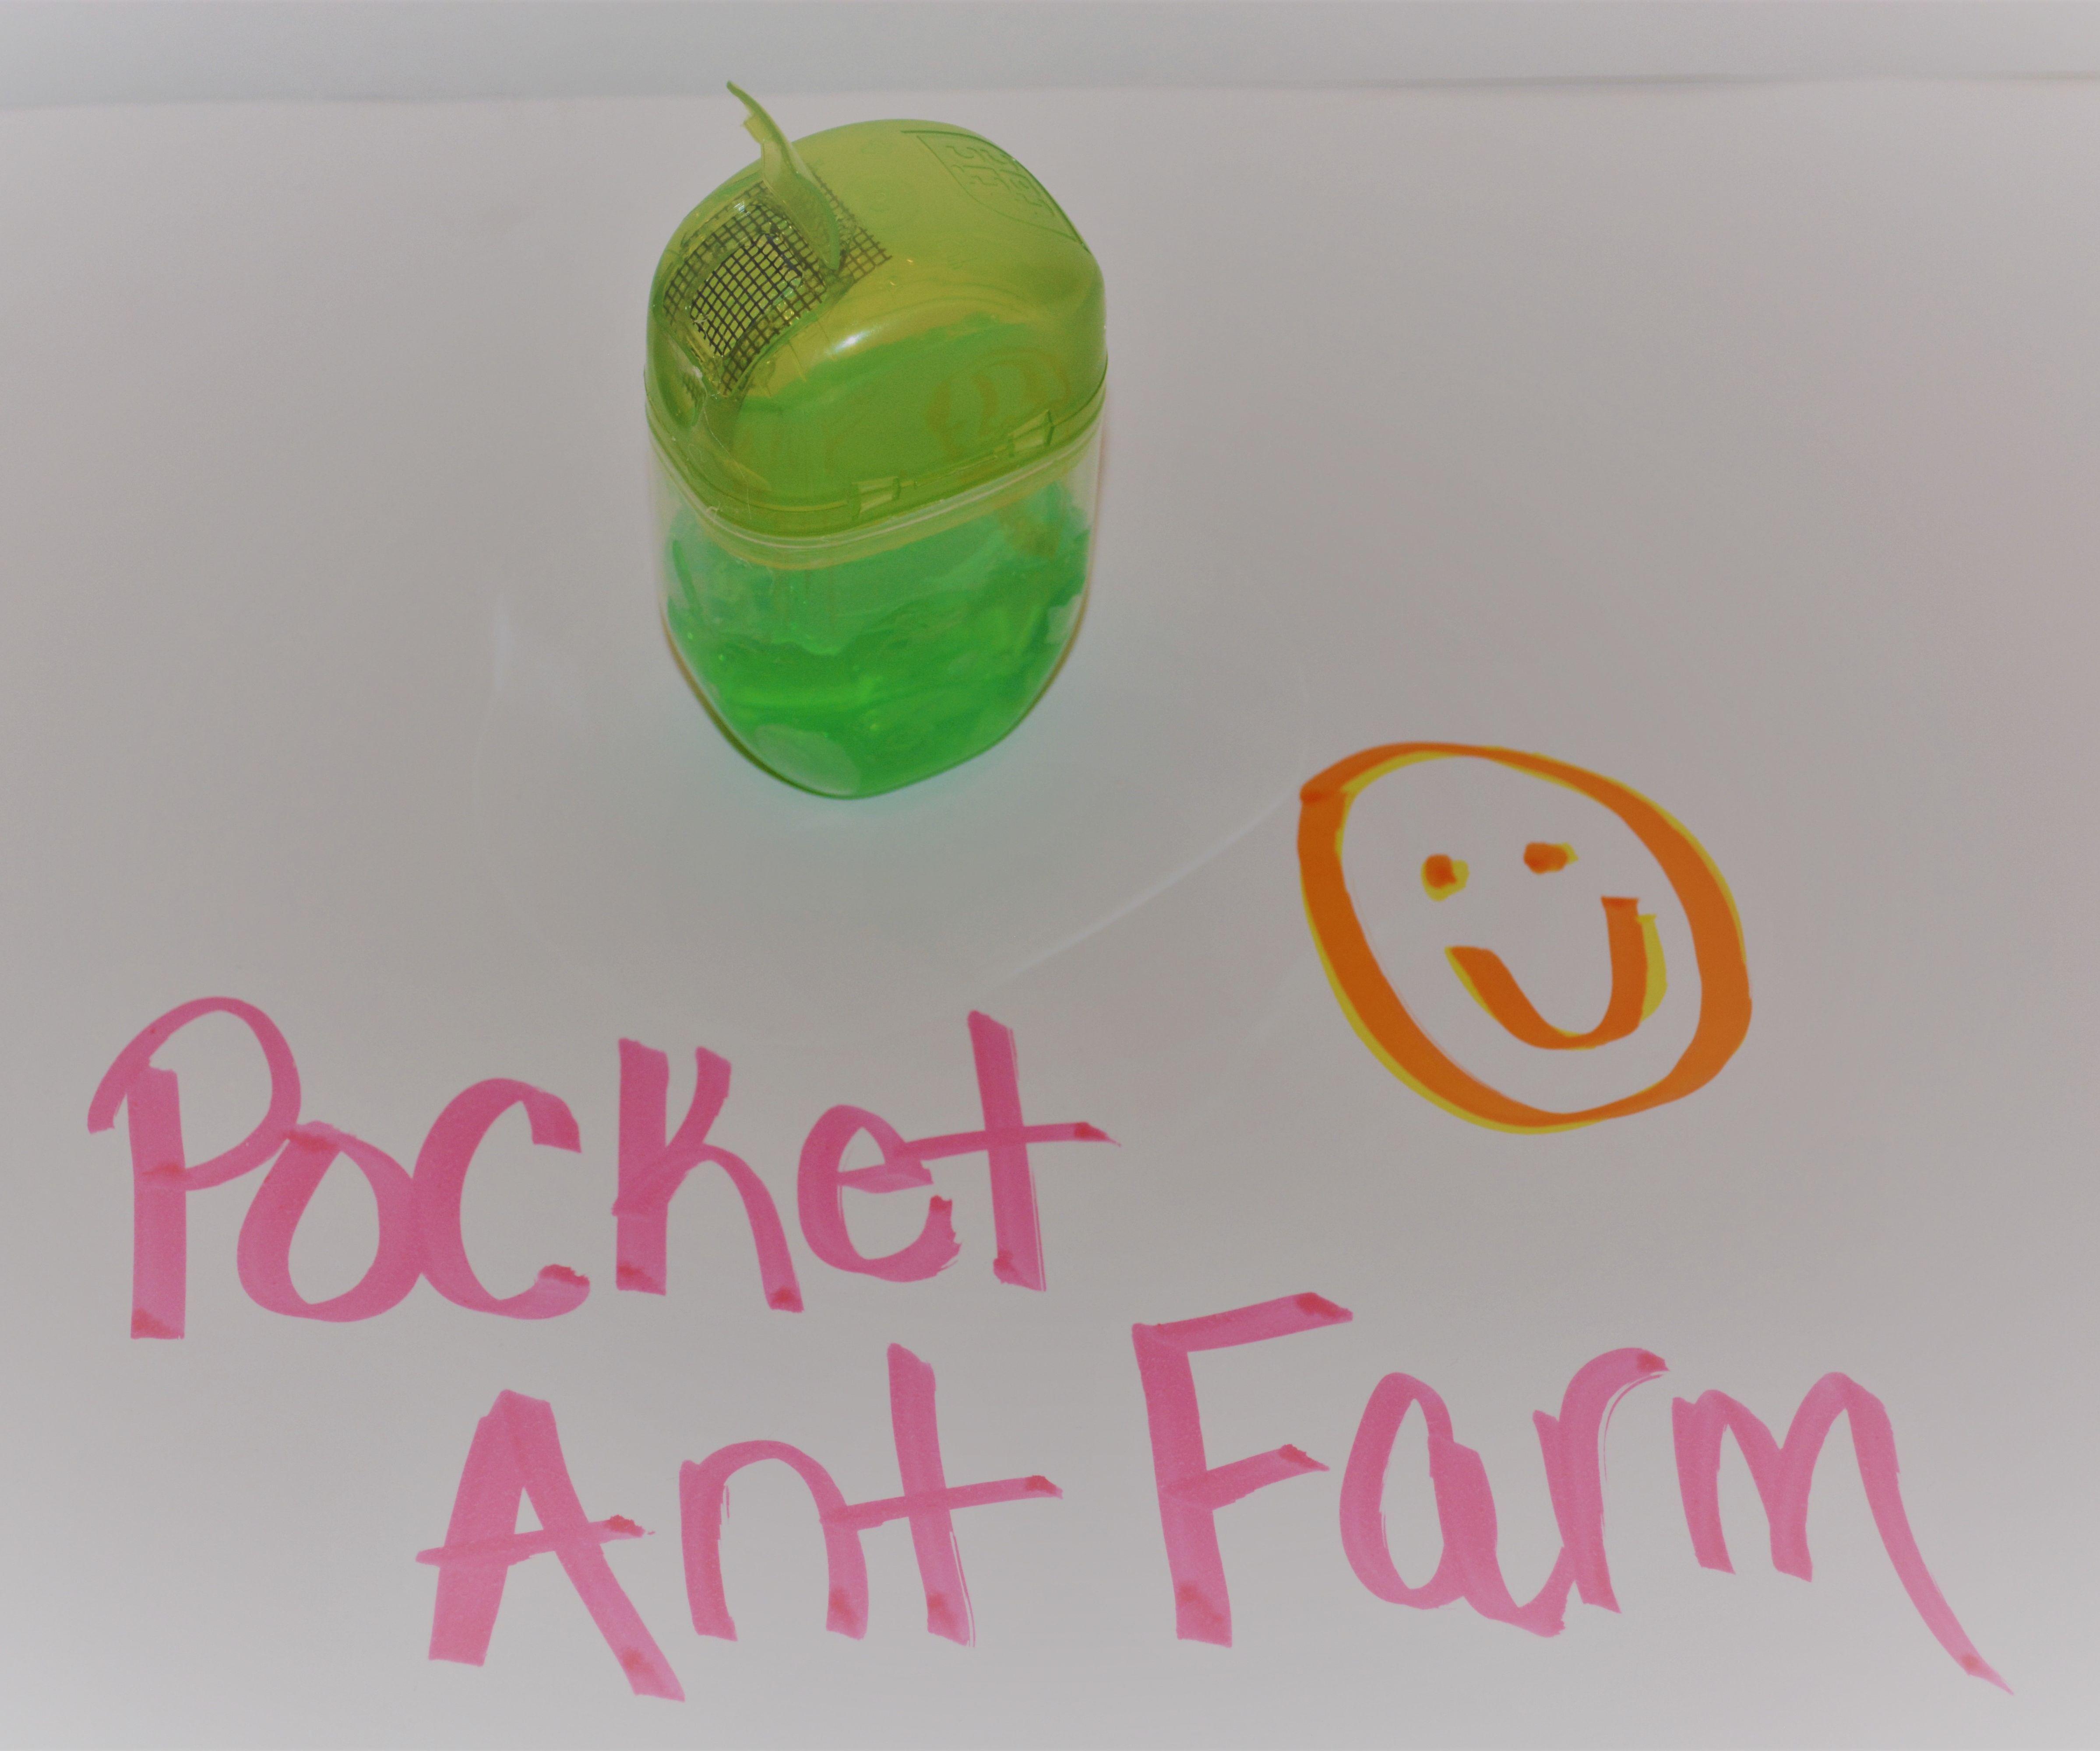 Pocket Size Ant Farm